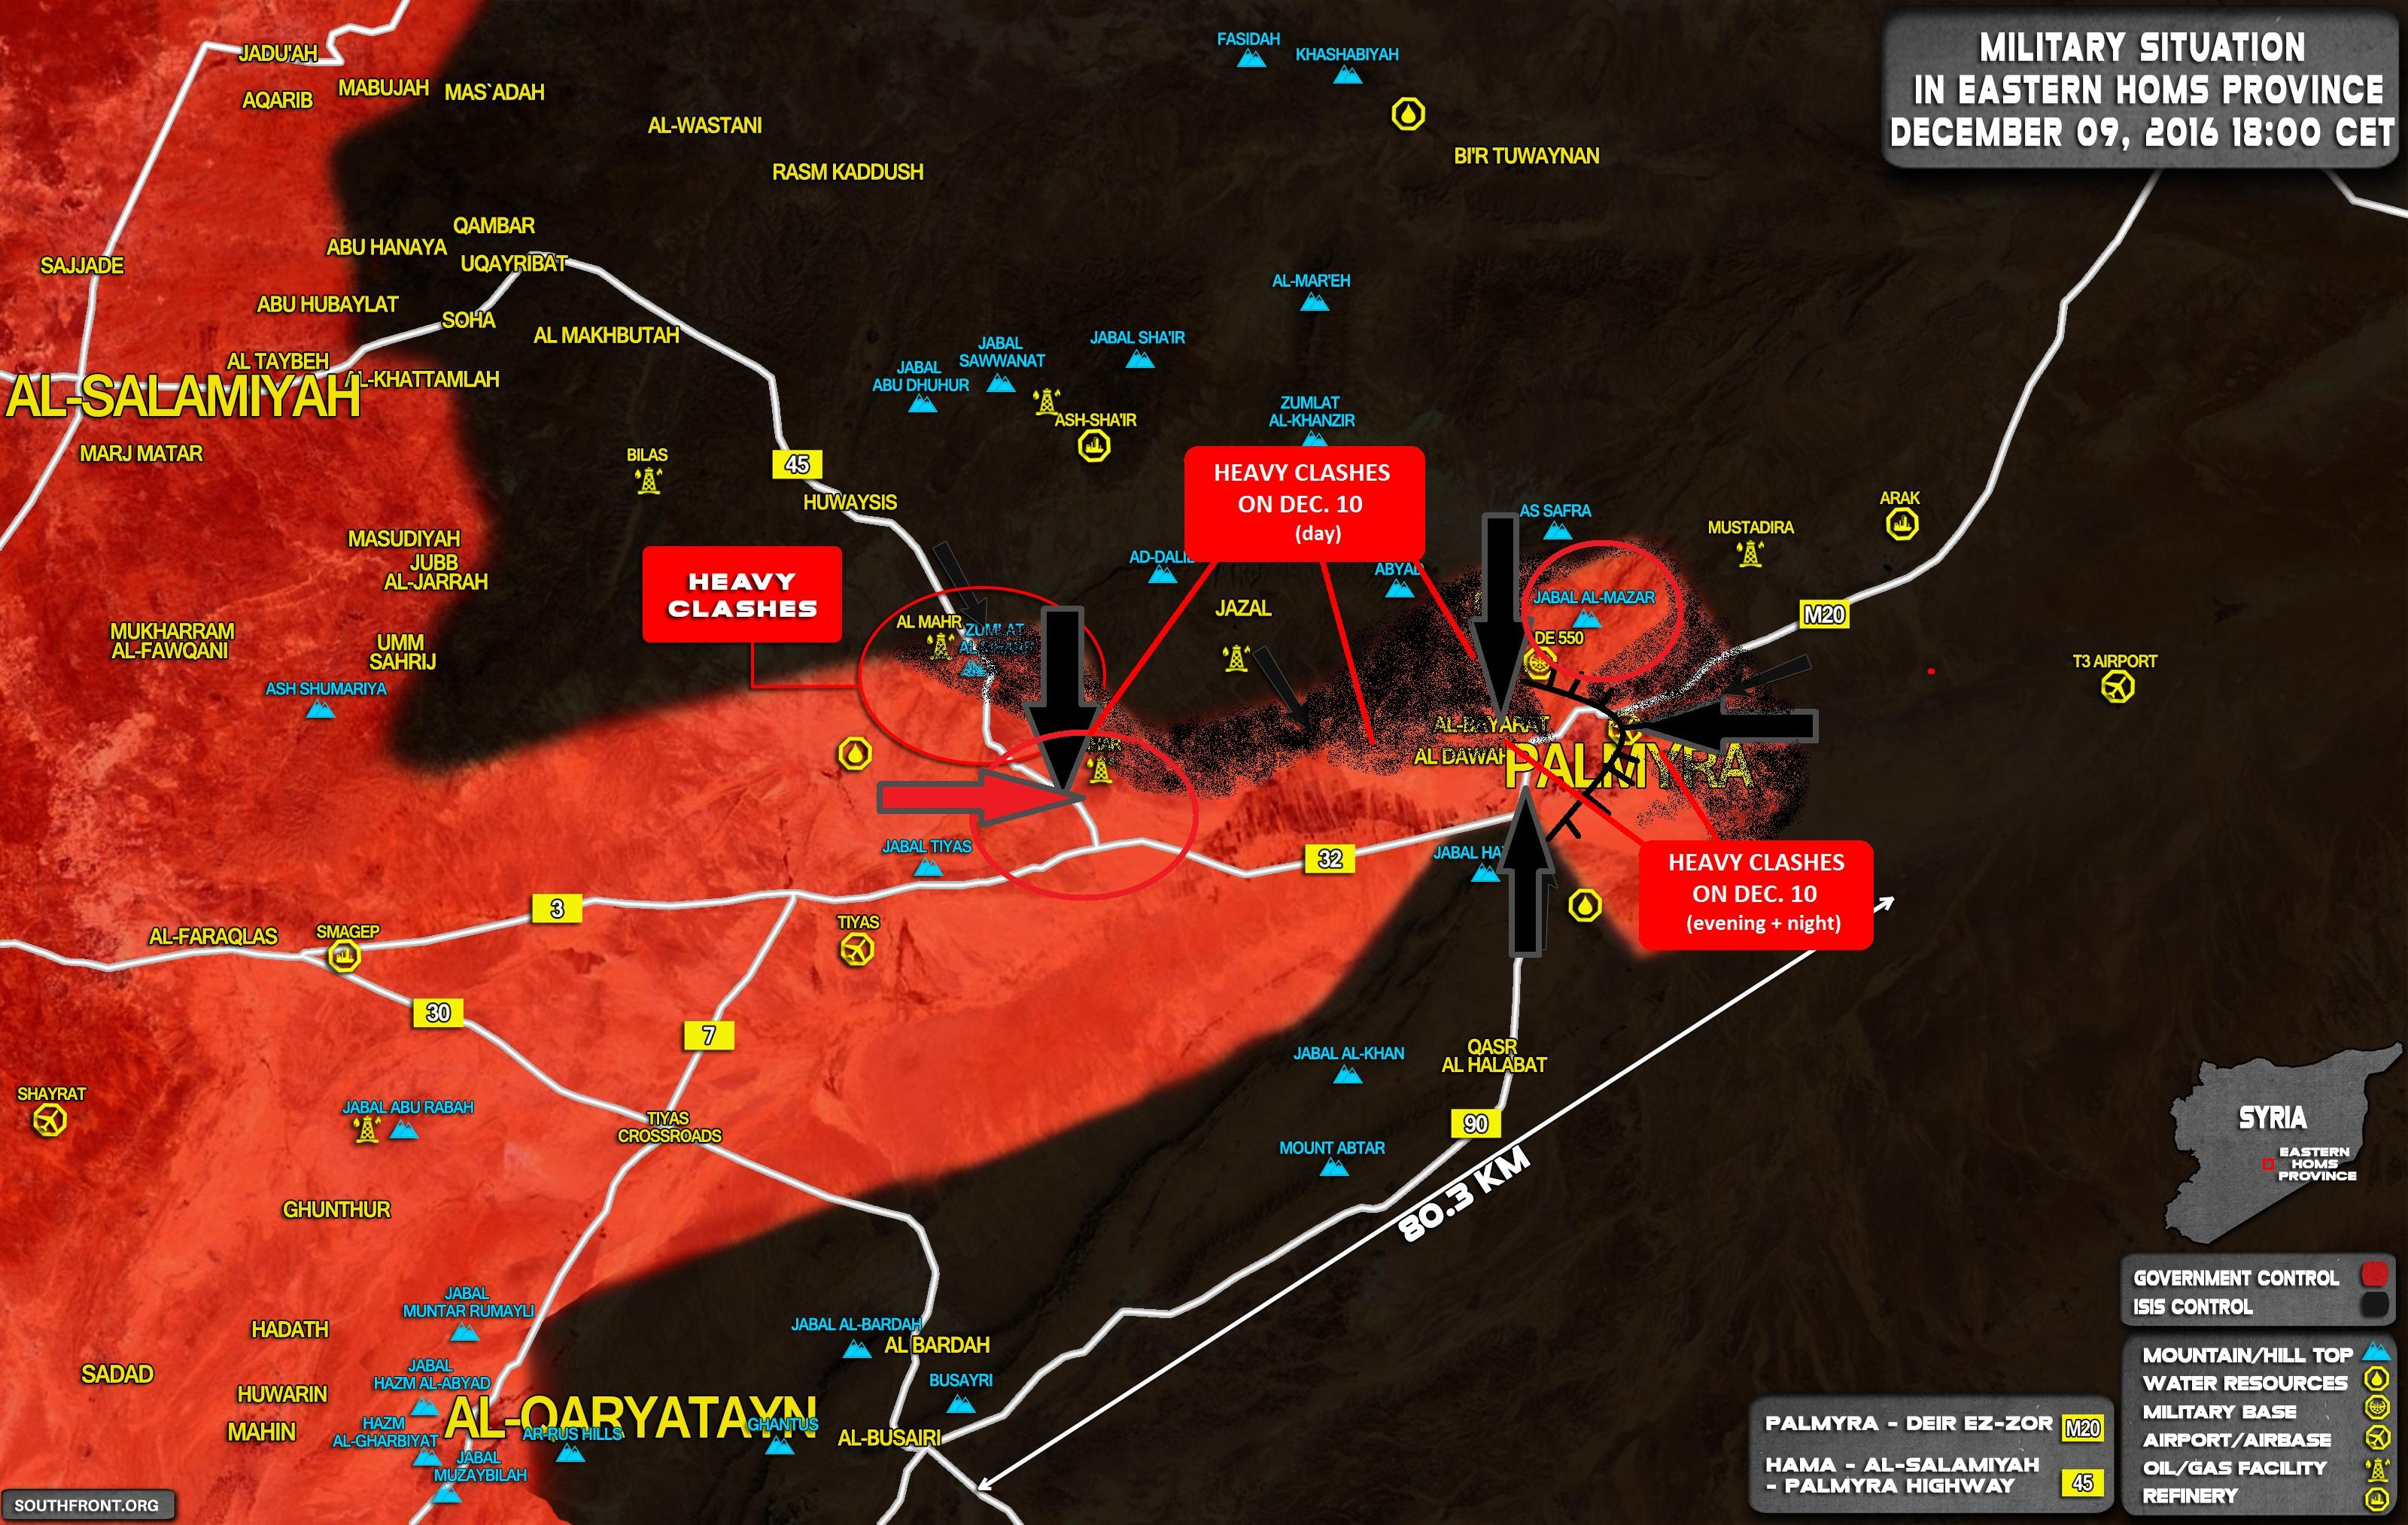 Extremal Situation near Palmyra (Events & Analysis)